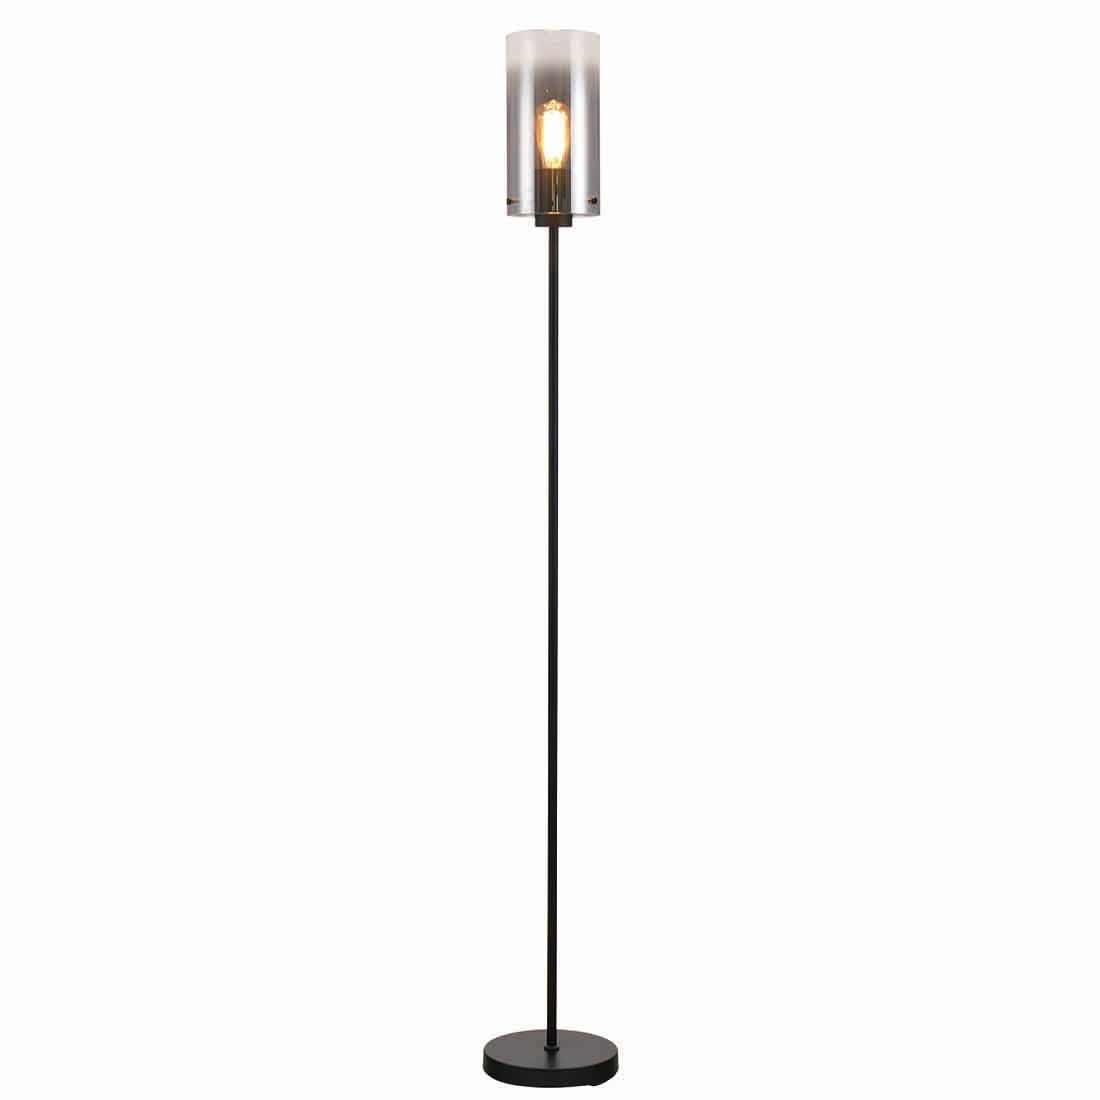 Freelight Vloerlamp Ventotto H 165 cm Ø 15 cm rook glas zwart